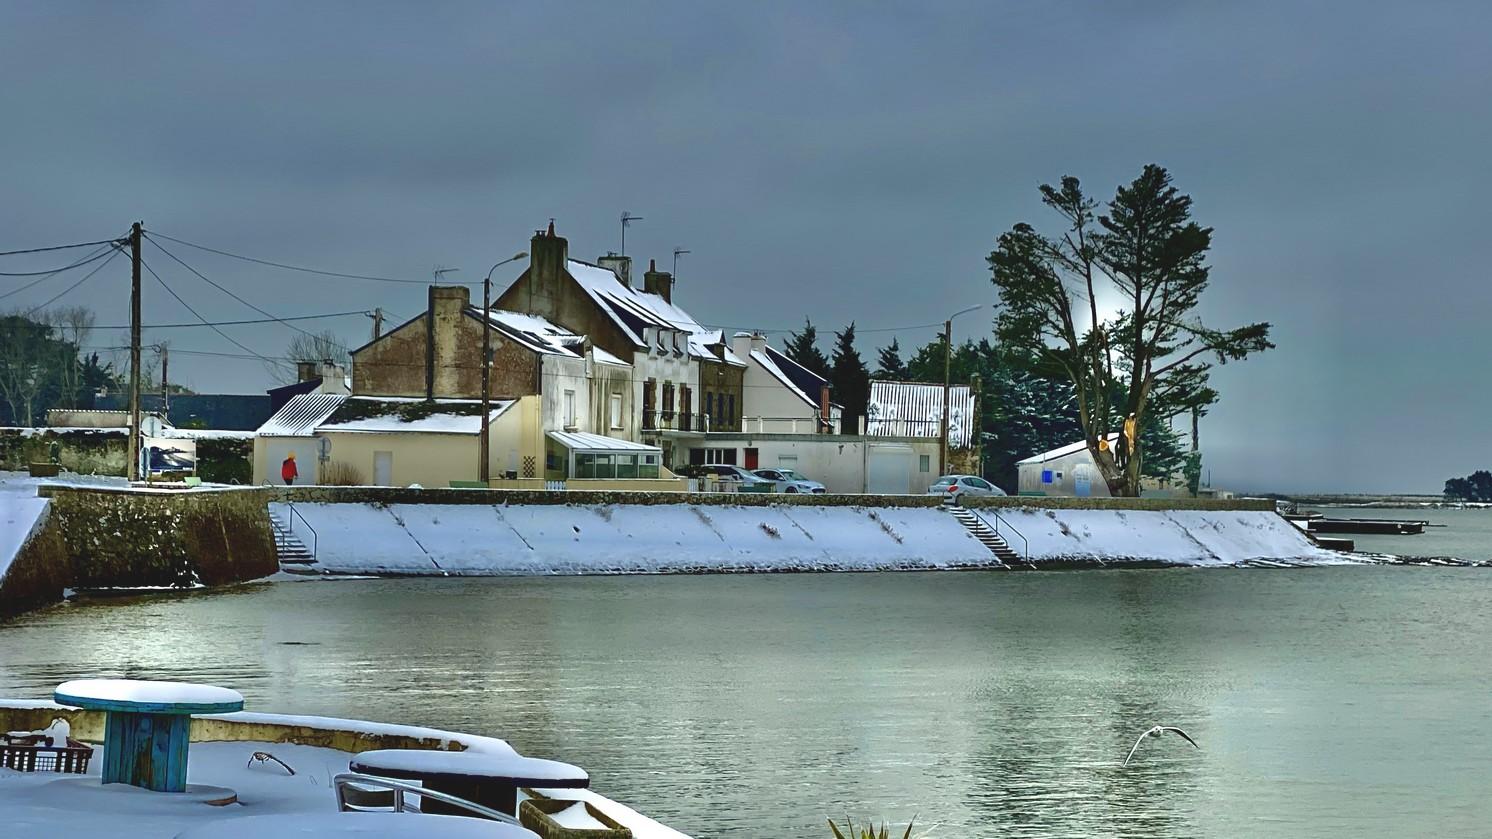 Penerf en Damgan sous la neige - morbihan bretagne©Philippe Jaquemin (20)